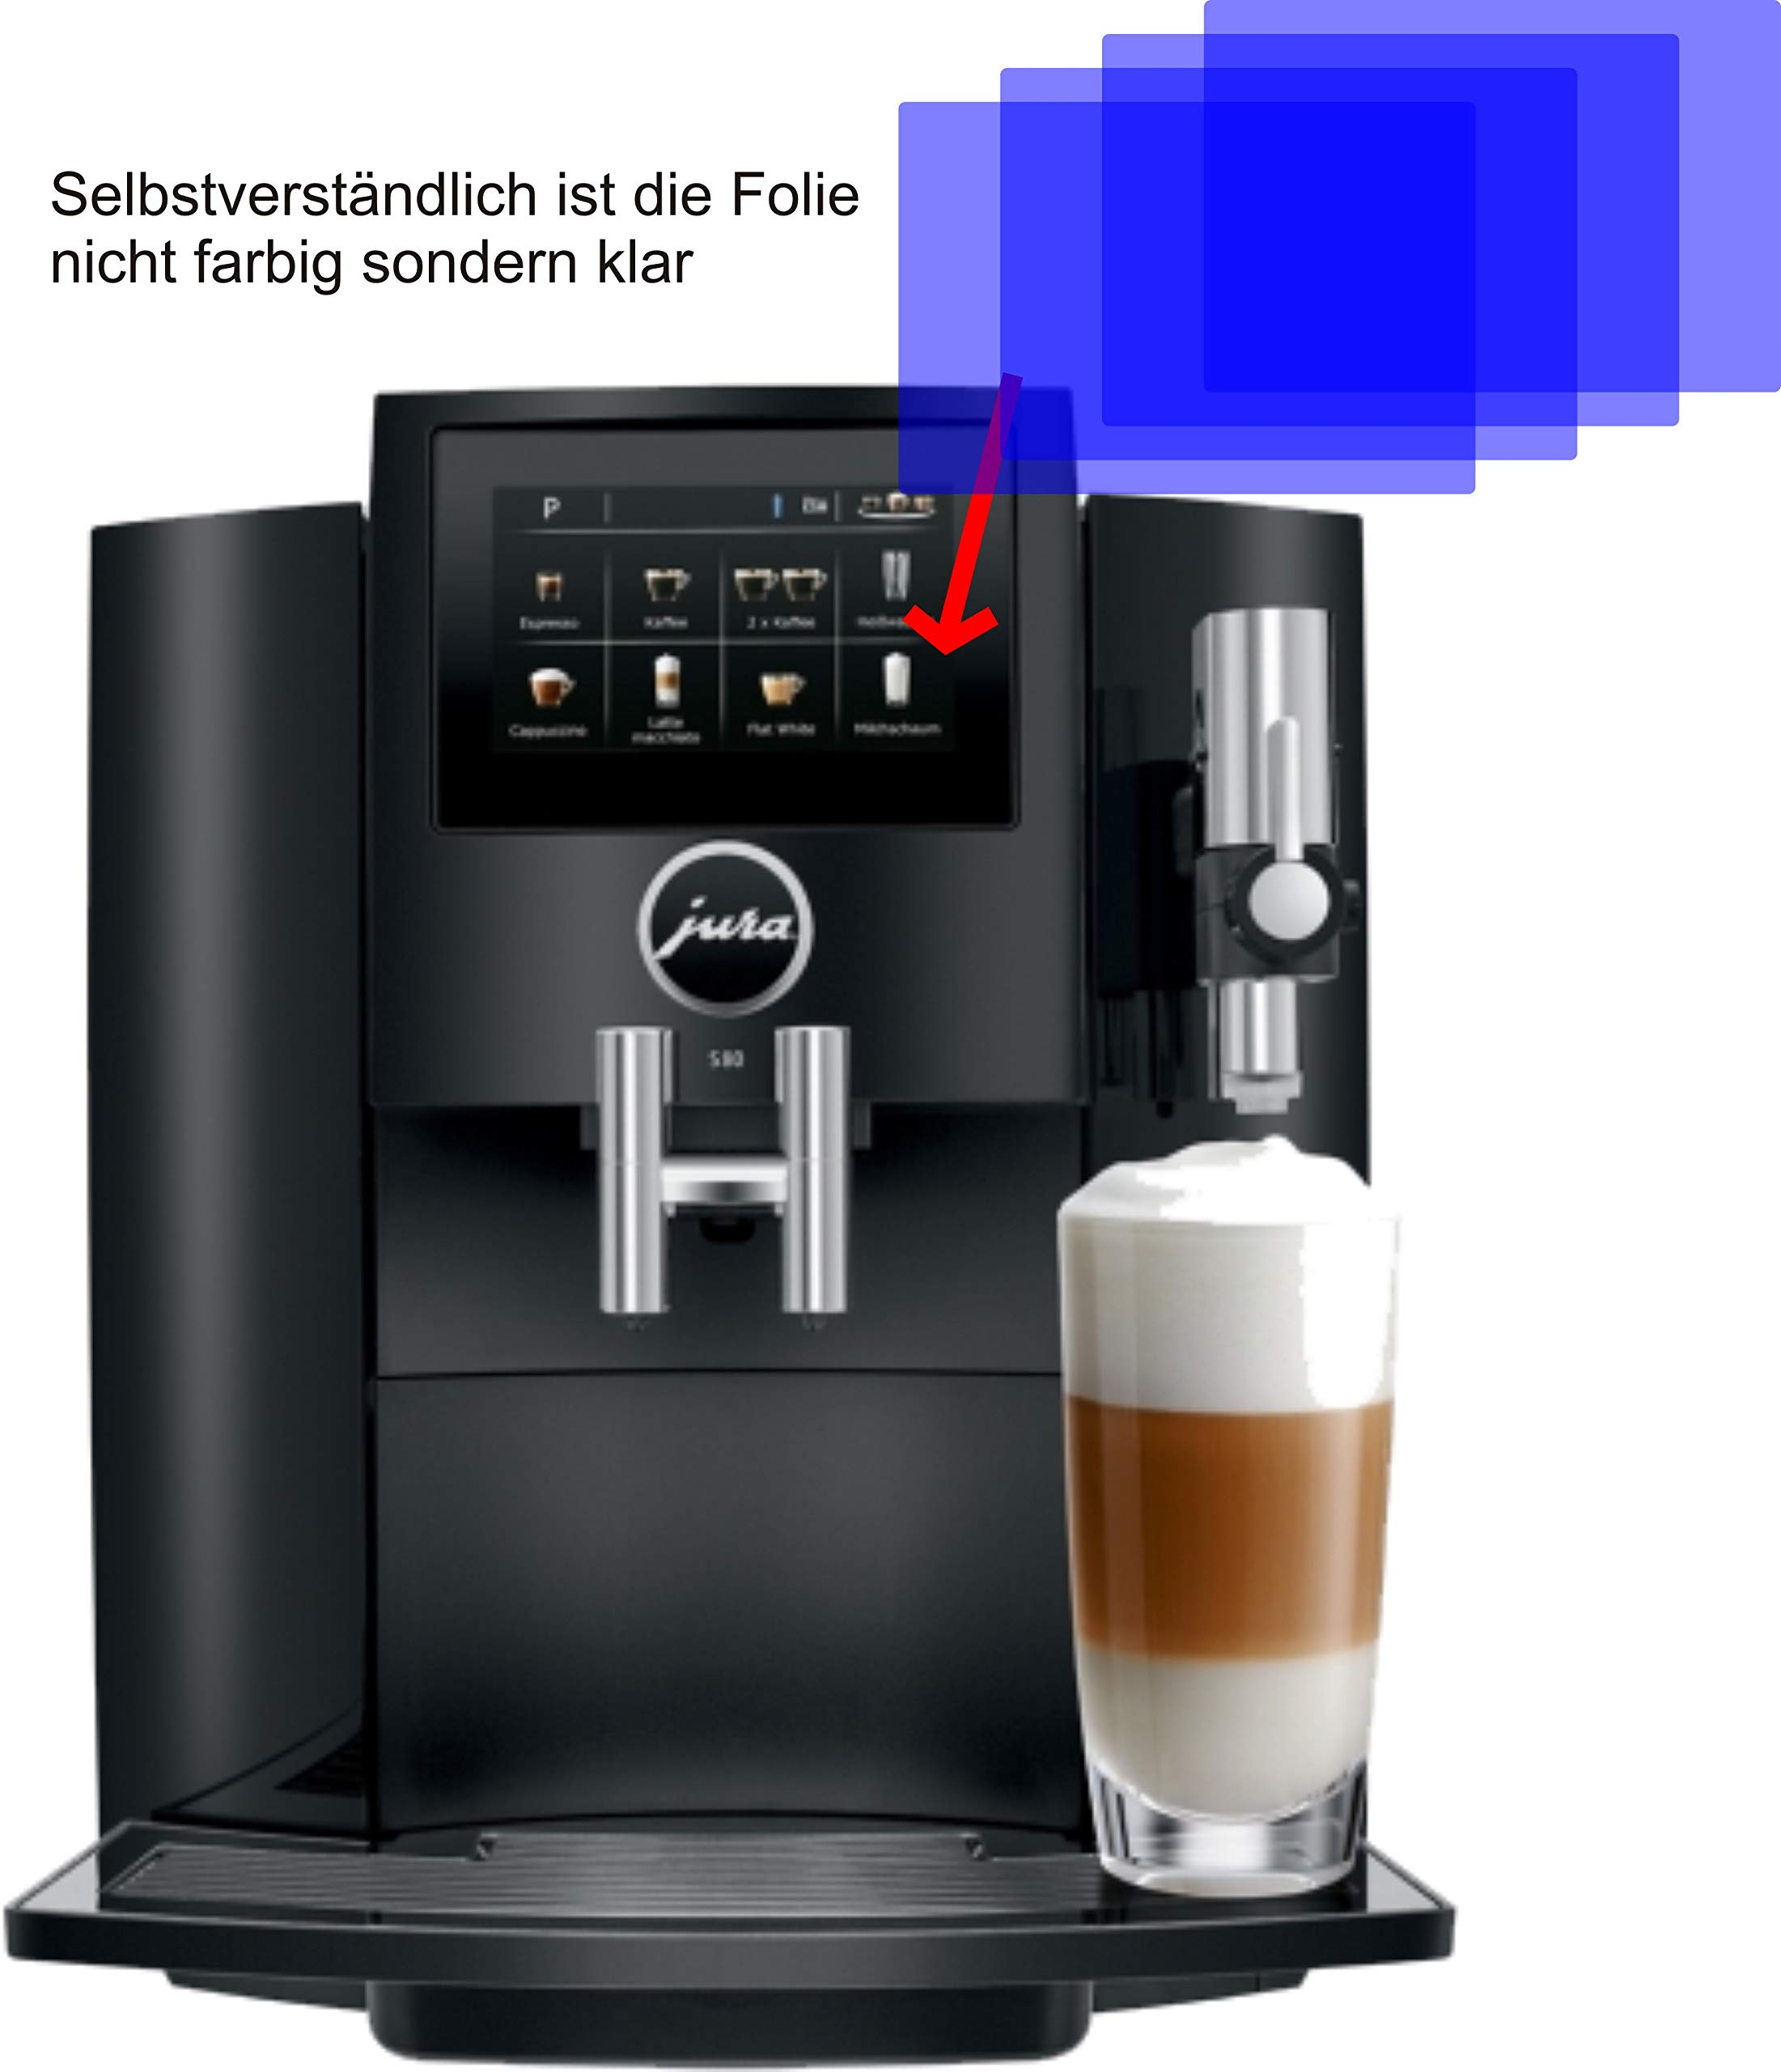 4X-ANTIREFLEX-matt-Schutzfolie-fr-Jura-S80-15204-Kaffeevollautomat-Displayschutzfolie-Bildschirmschutzfolie-Schutzhlle-Displayschutz-Displayfolie-Folie